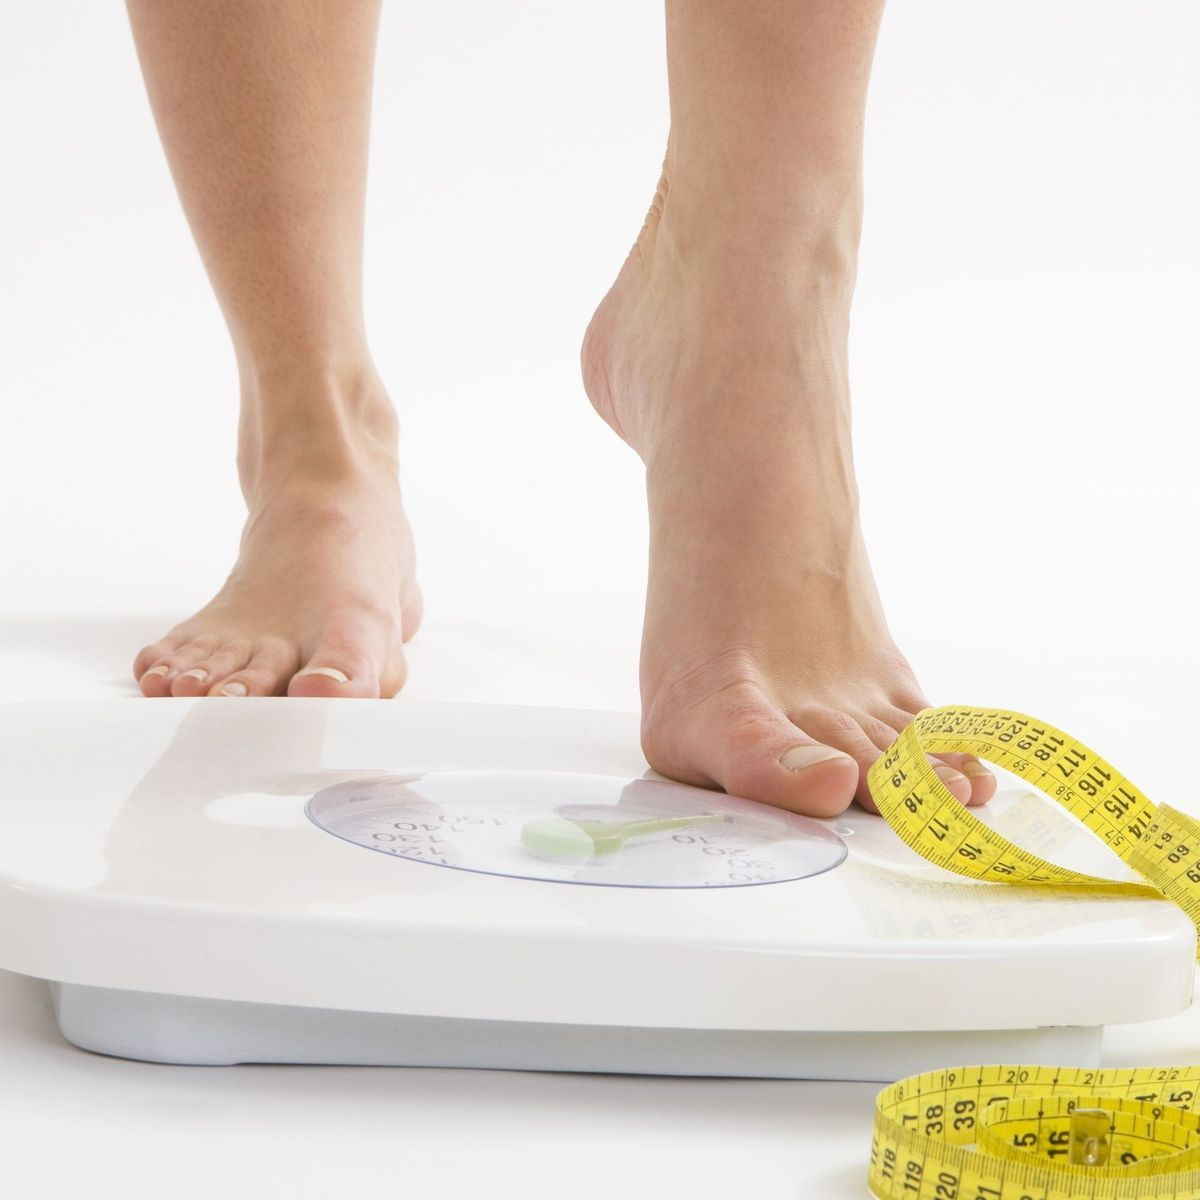 calcul du poids ideal